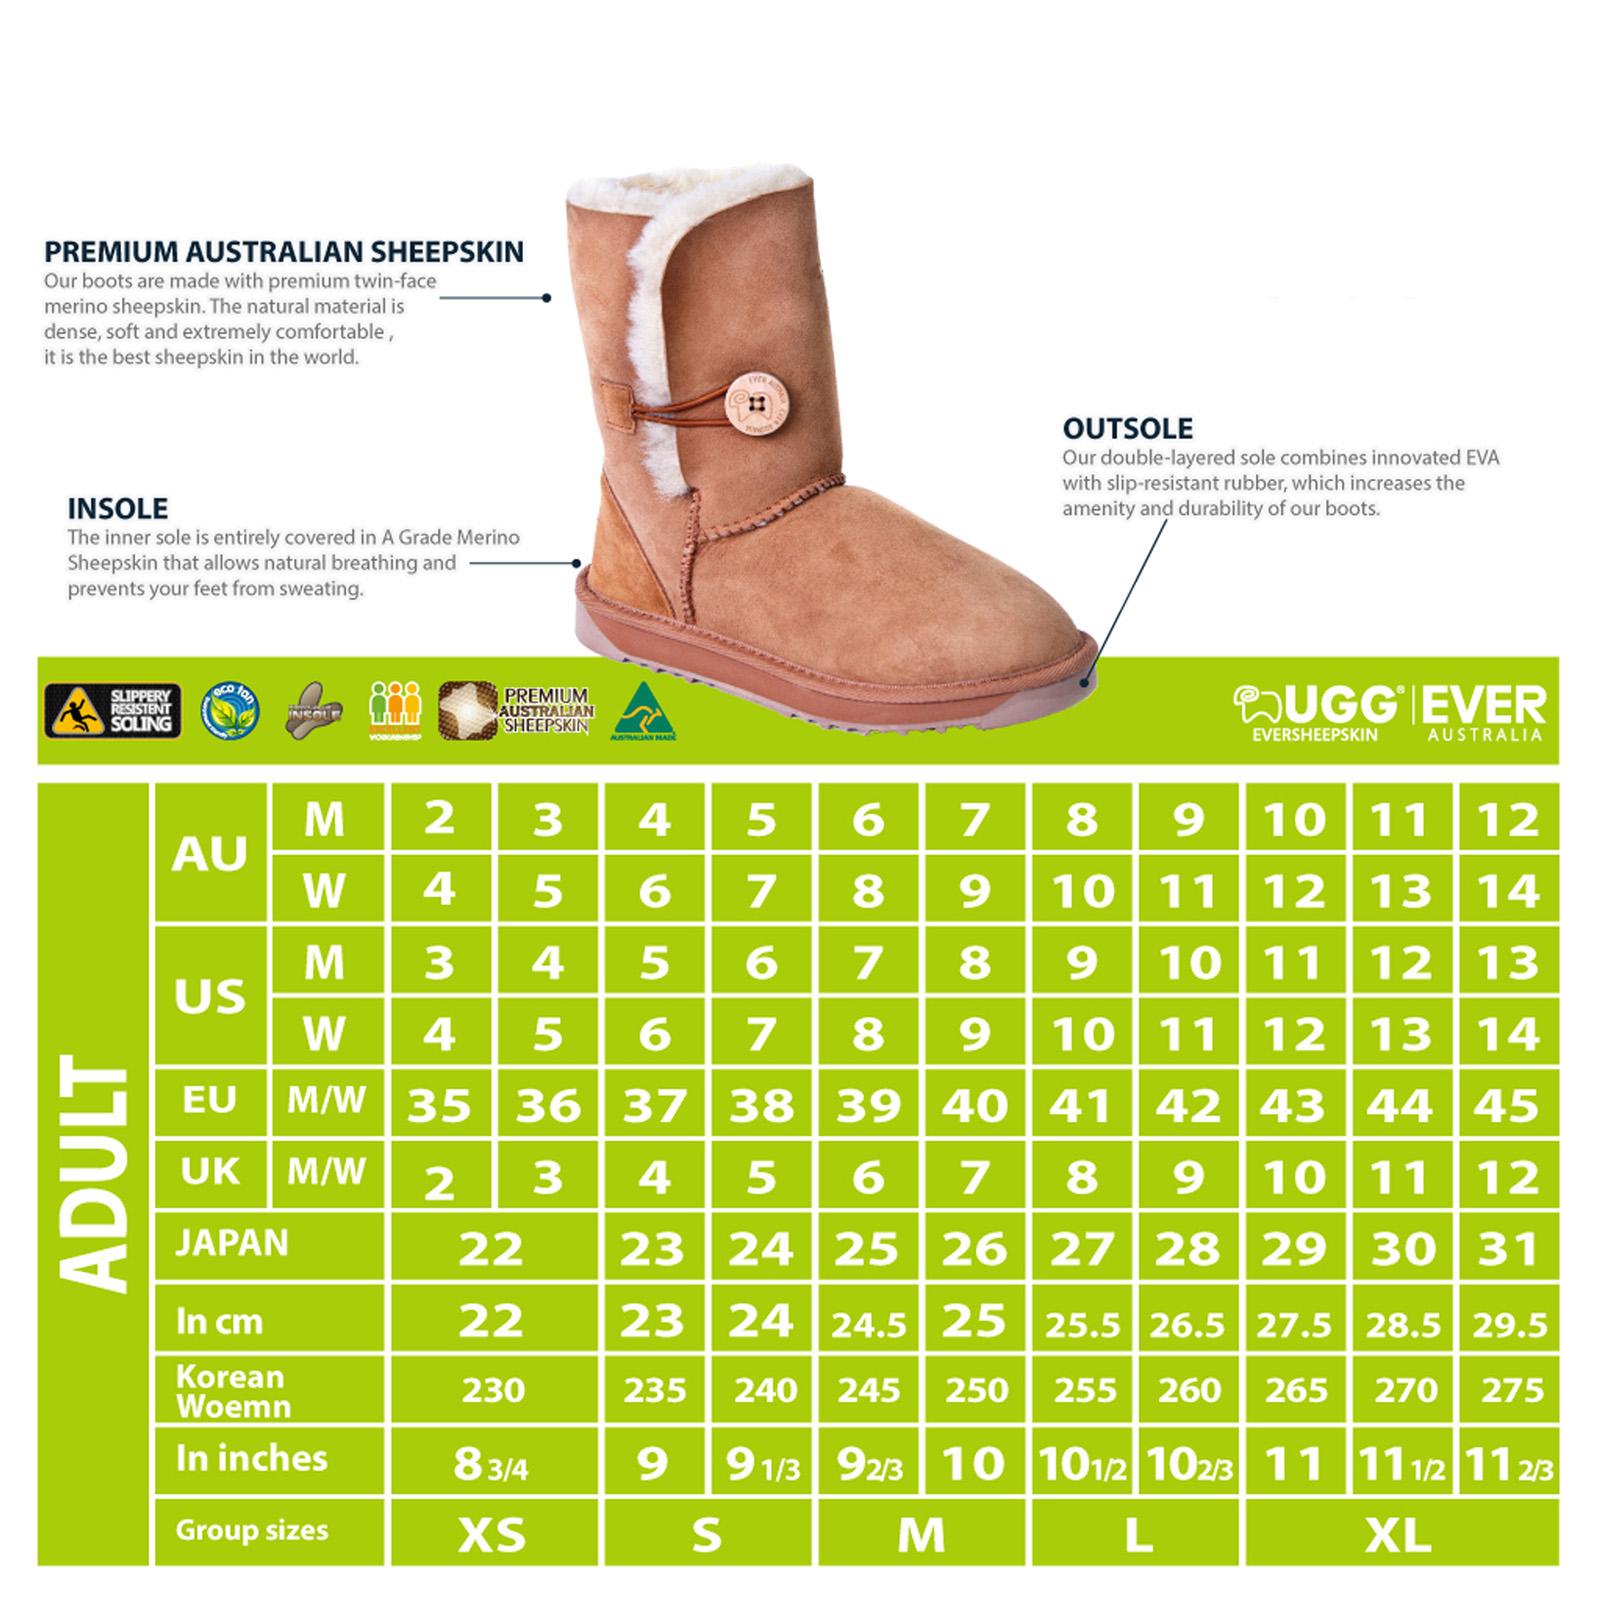 d603edb6e65 Details about Ugg Boots Baby Infant Booties Kids Australian Sheepskin No  Sole Pink Chestnut